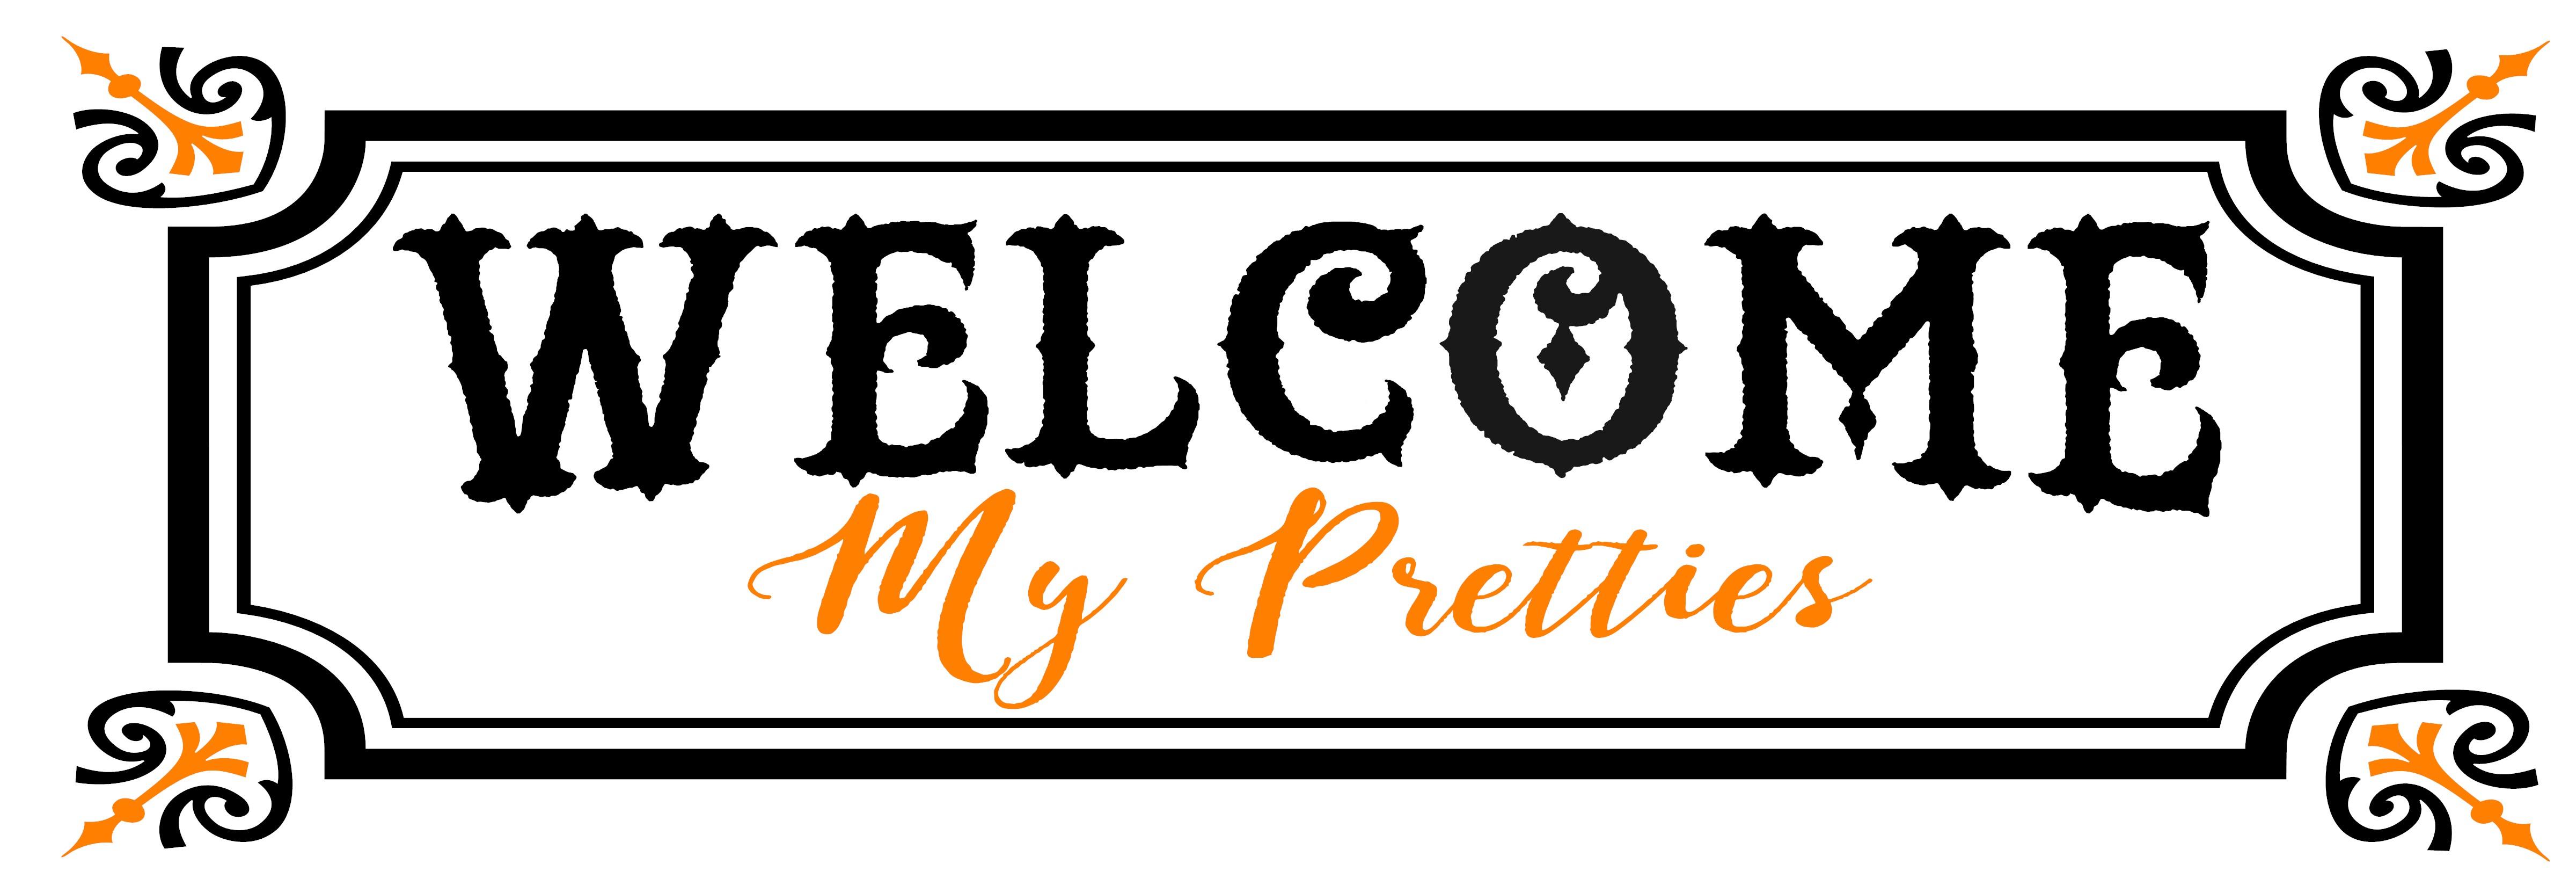 CB-Welcome My Pretties